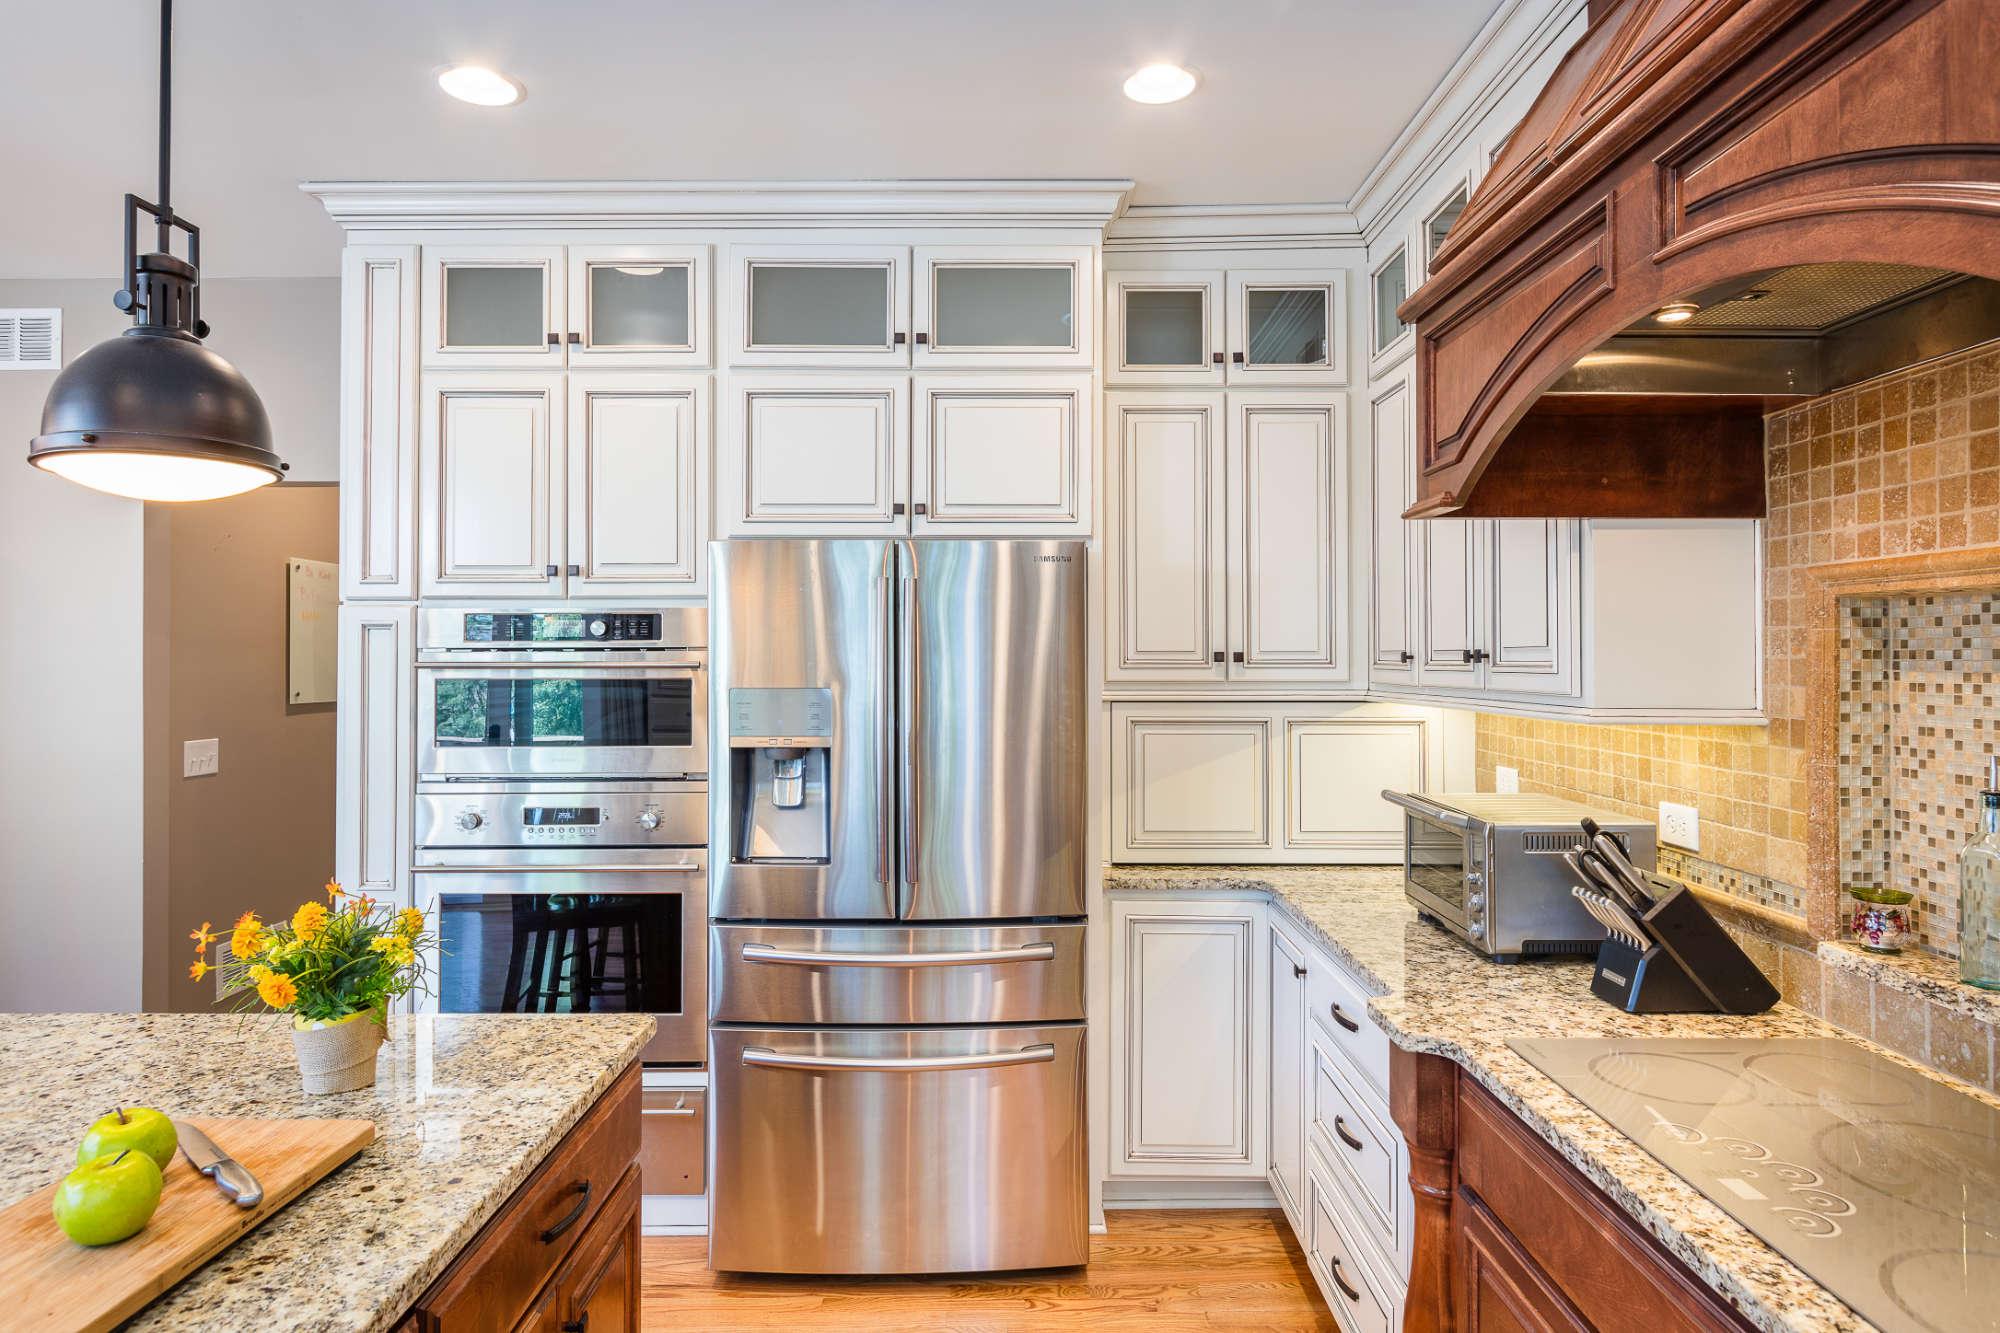 Kansas City Kitchen Remodel And Design